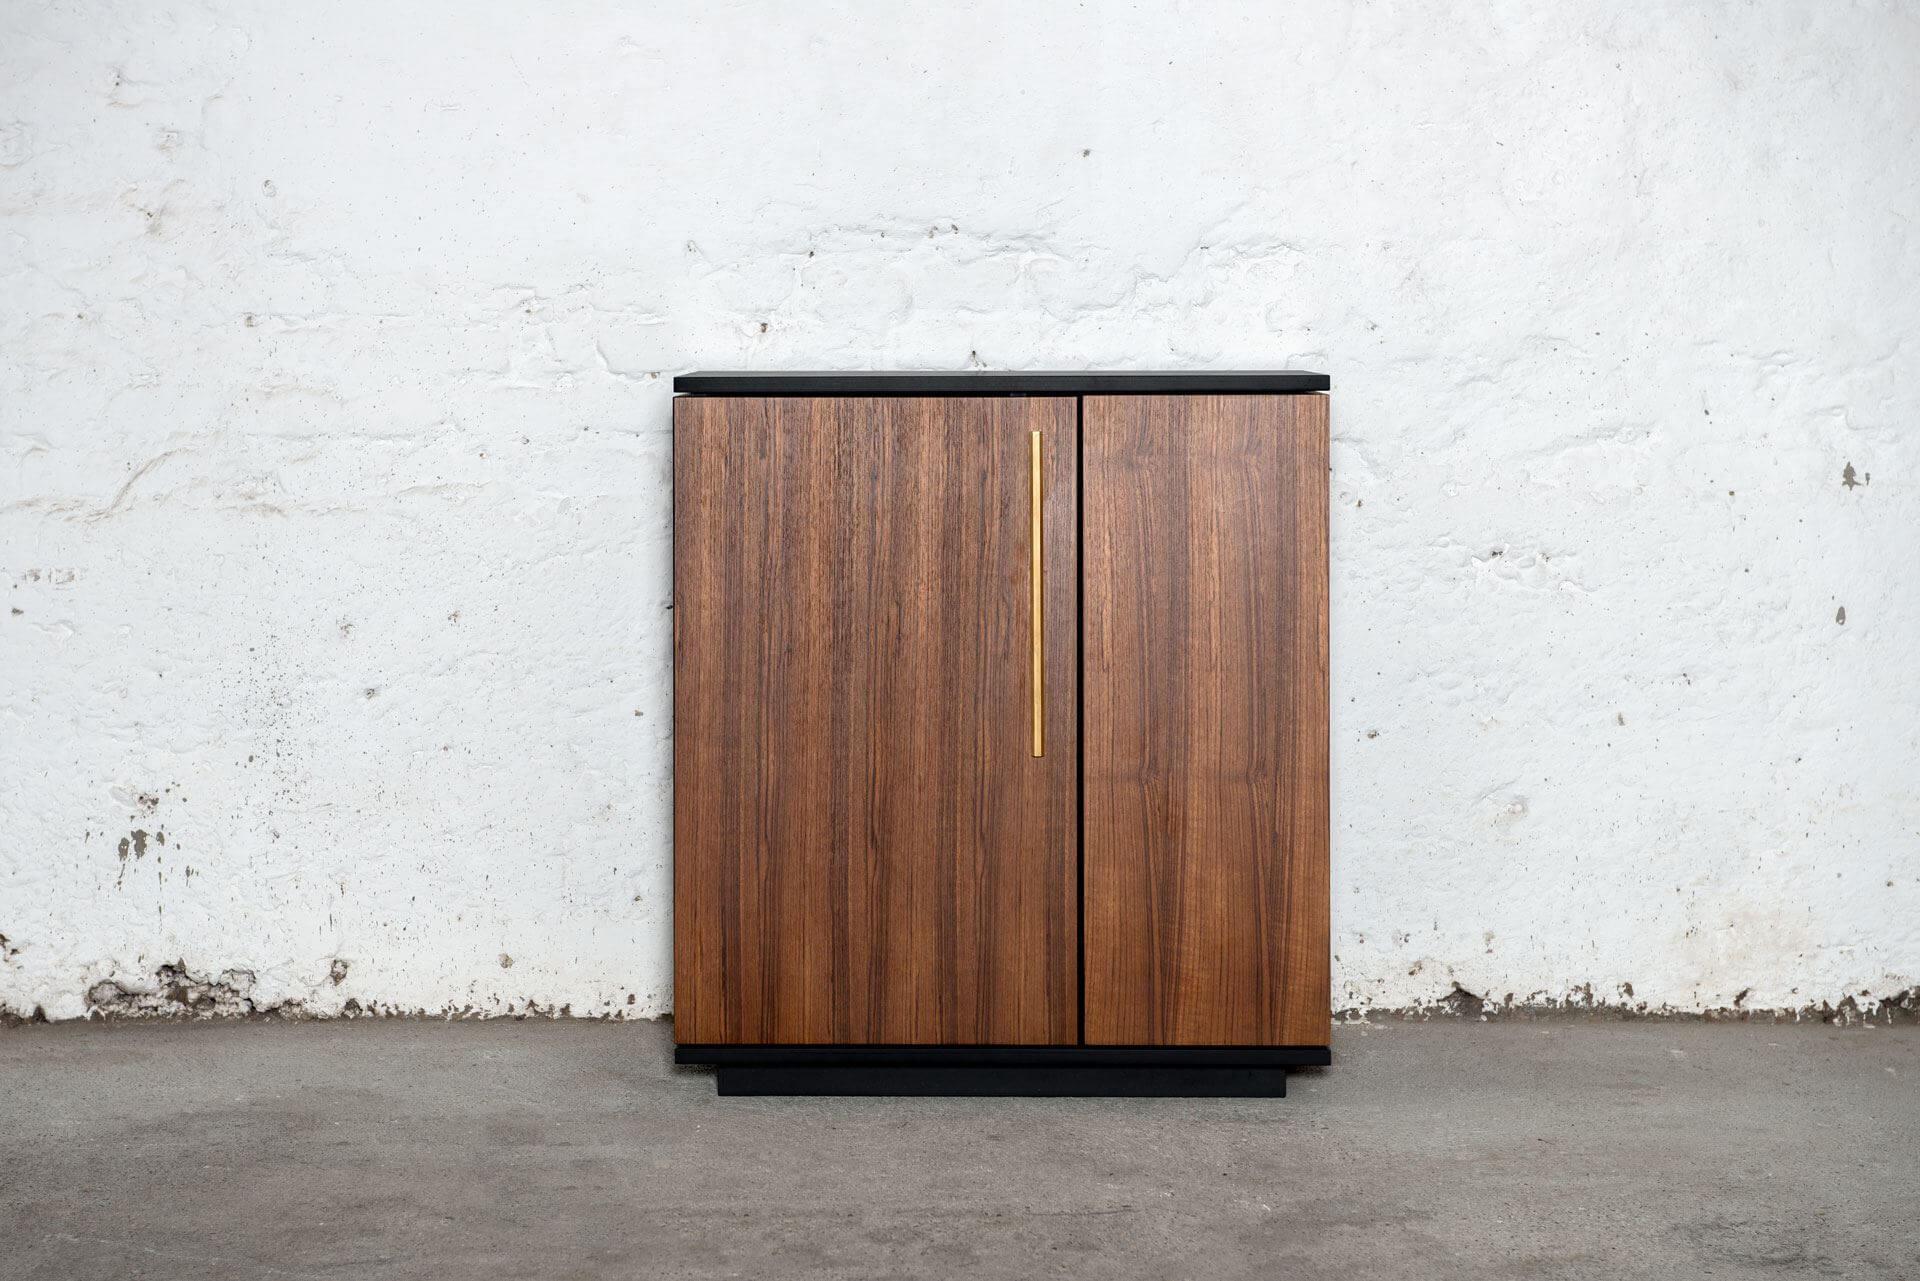 Barschrank-Teak-2-pult-design